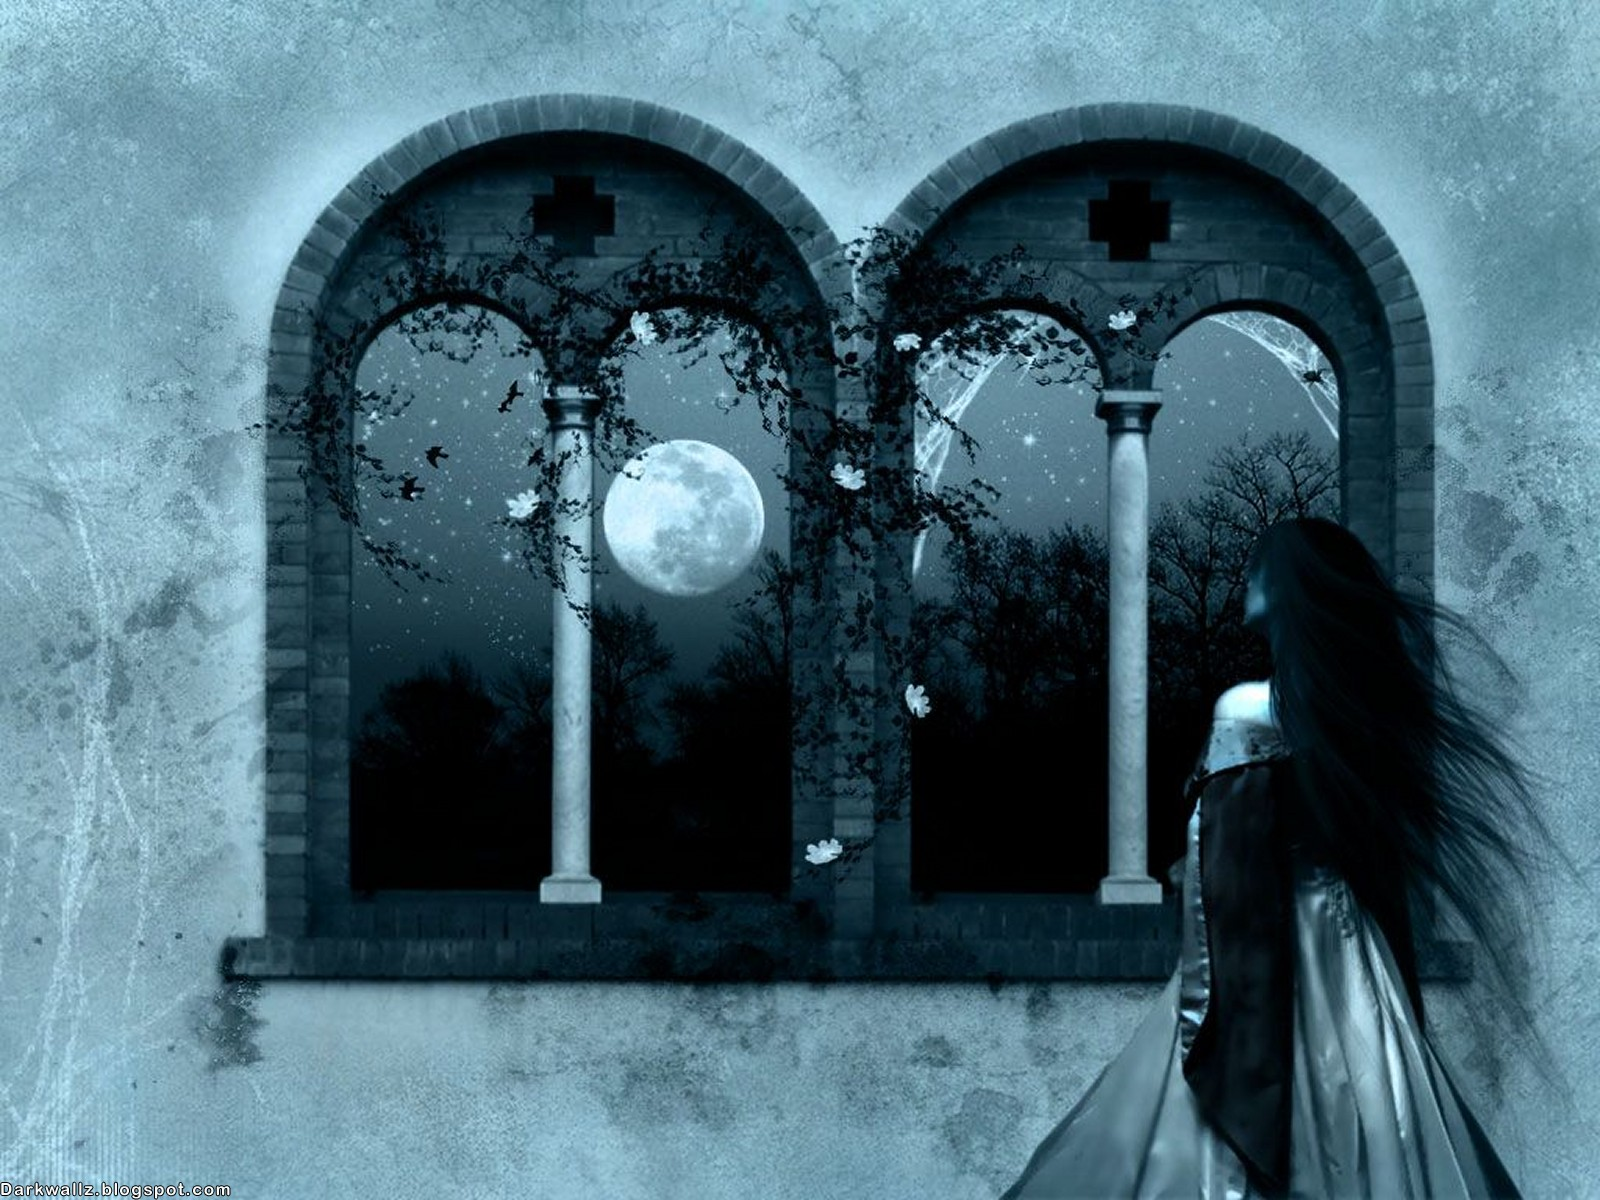 Dark Girls Wallpapers 03 (darkwallz